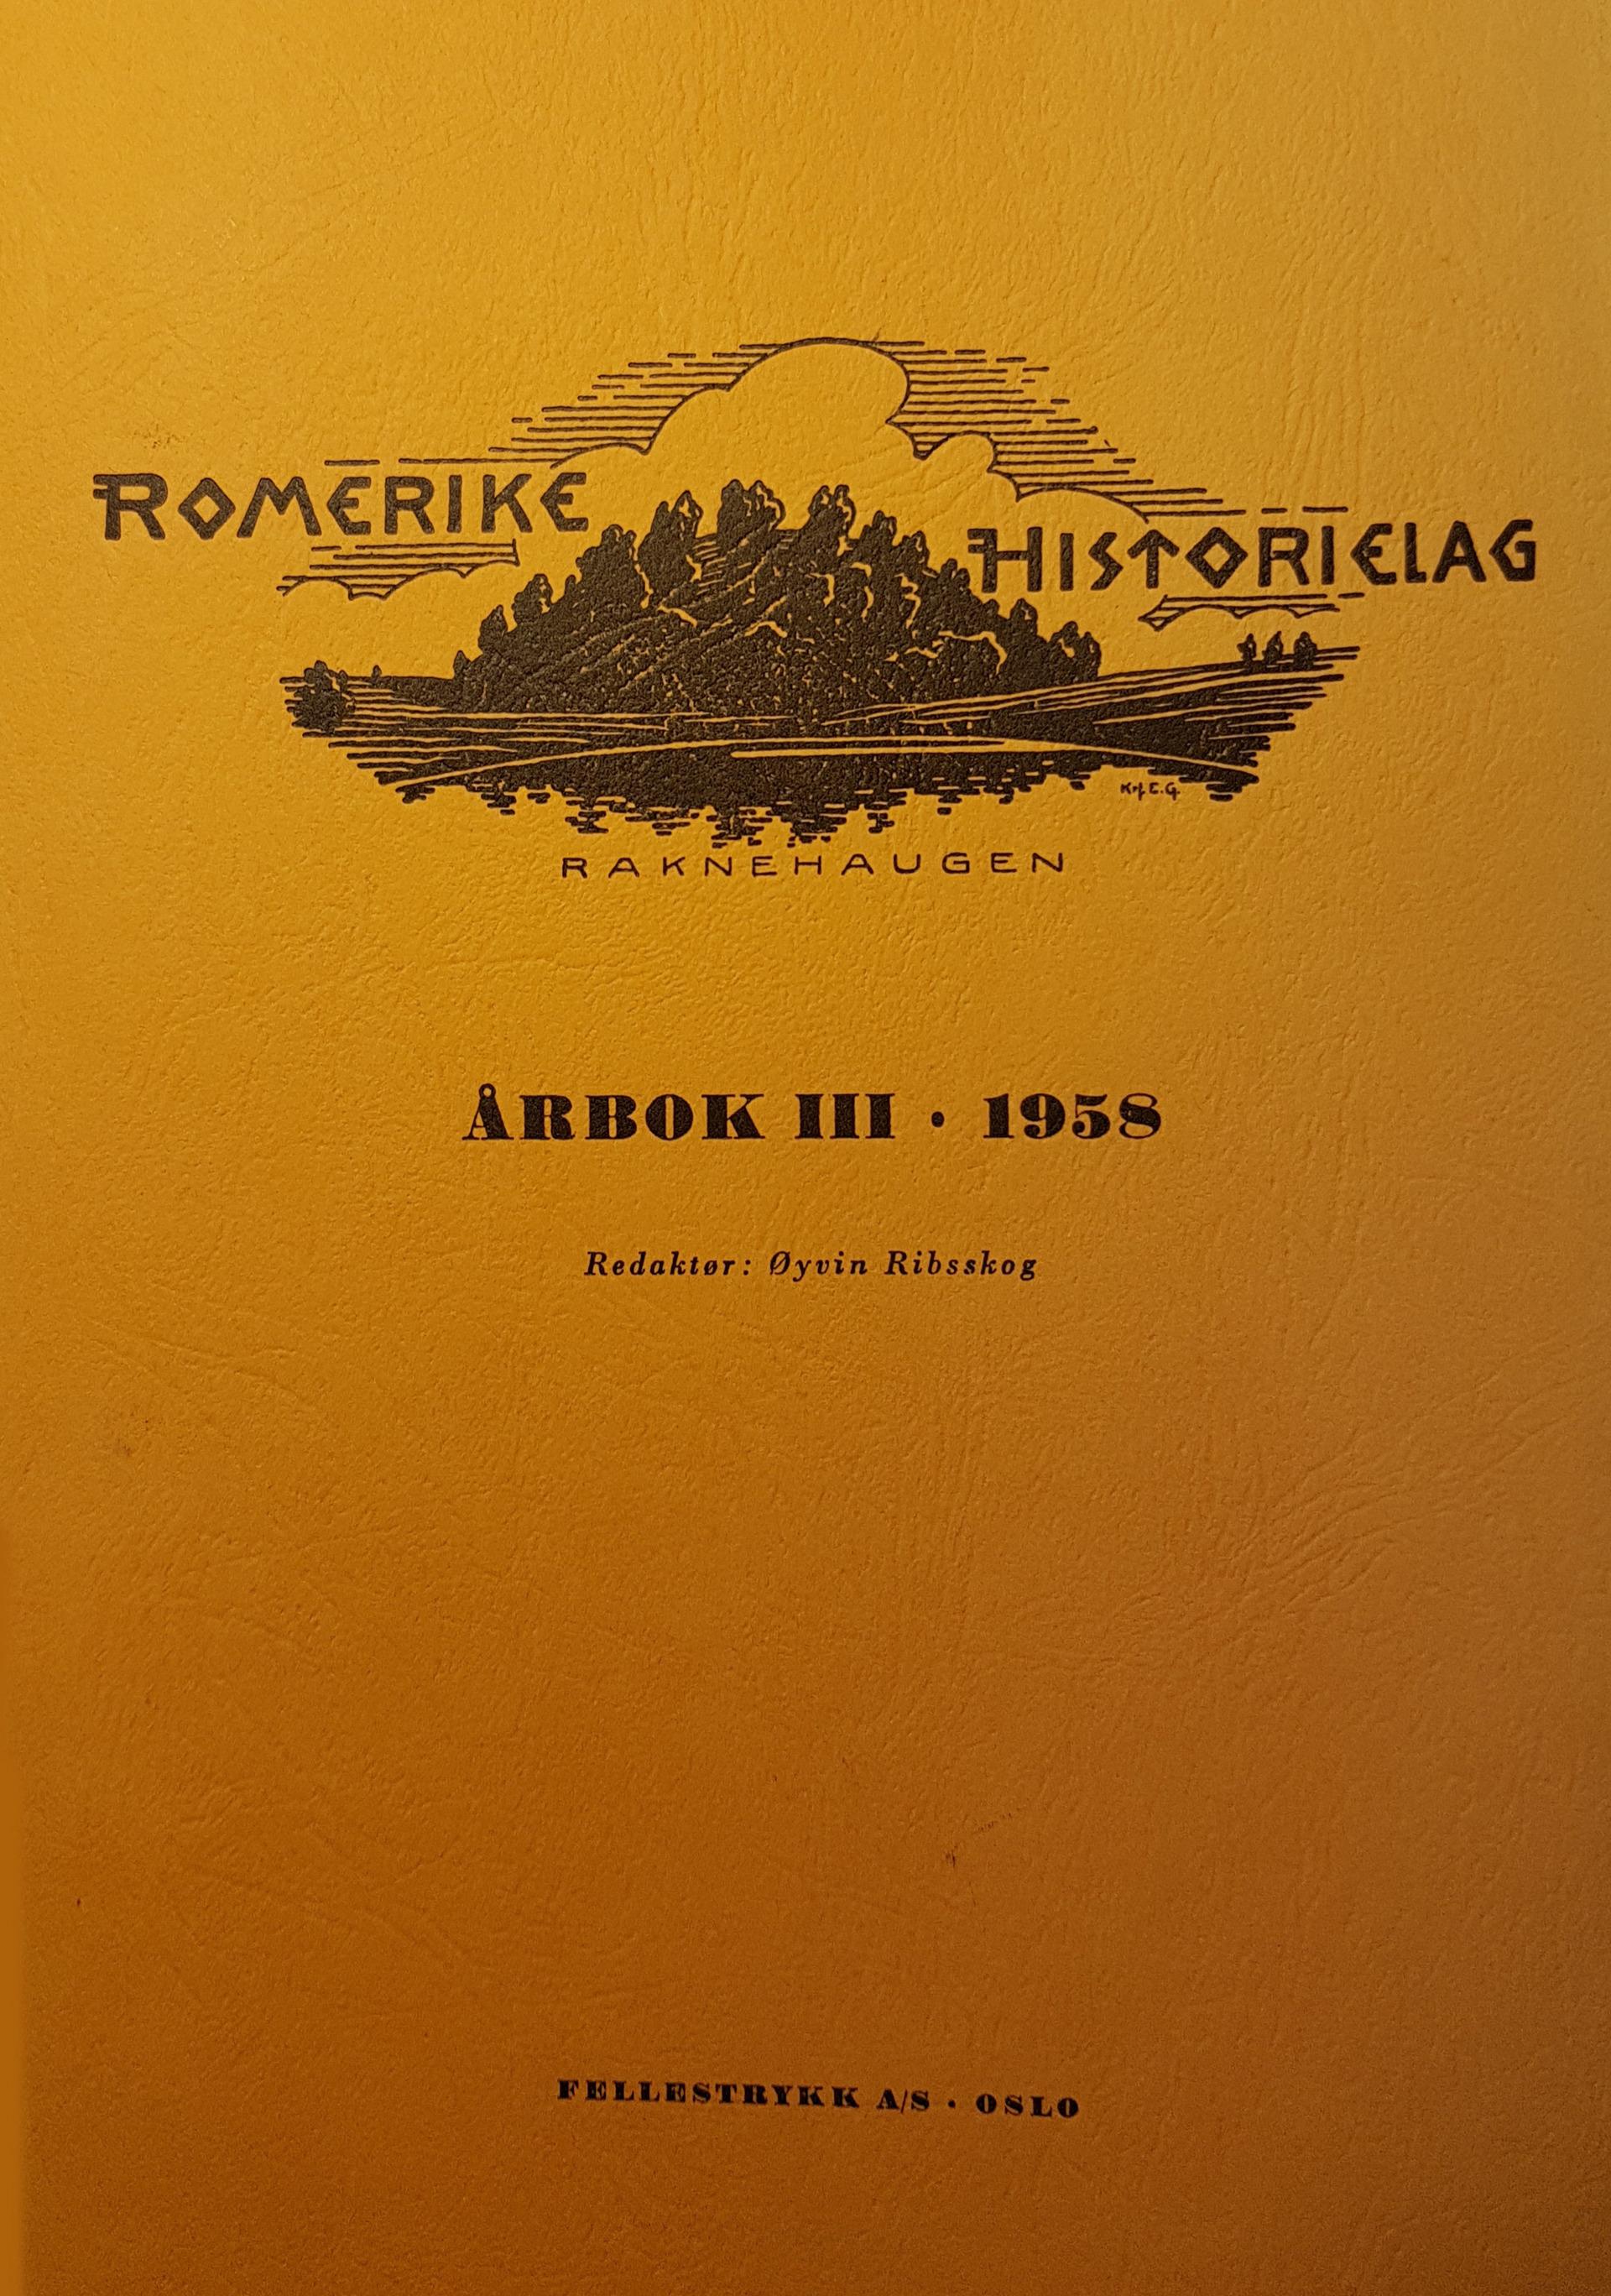 1958-arbok.jpg